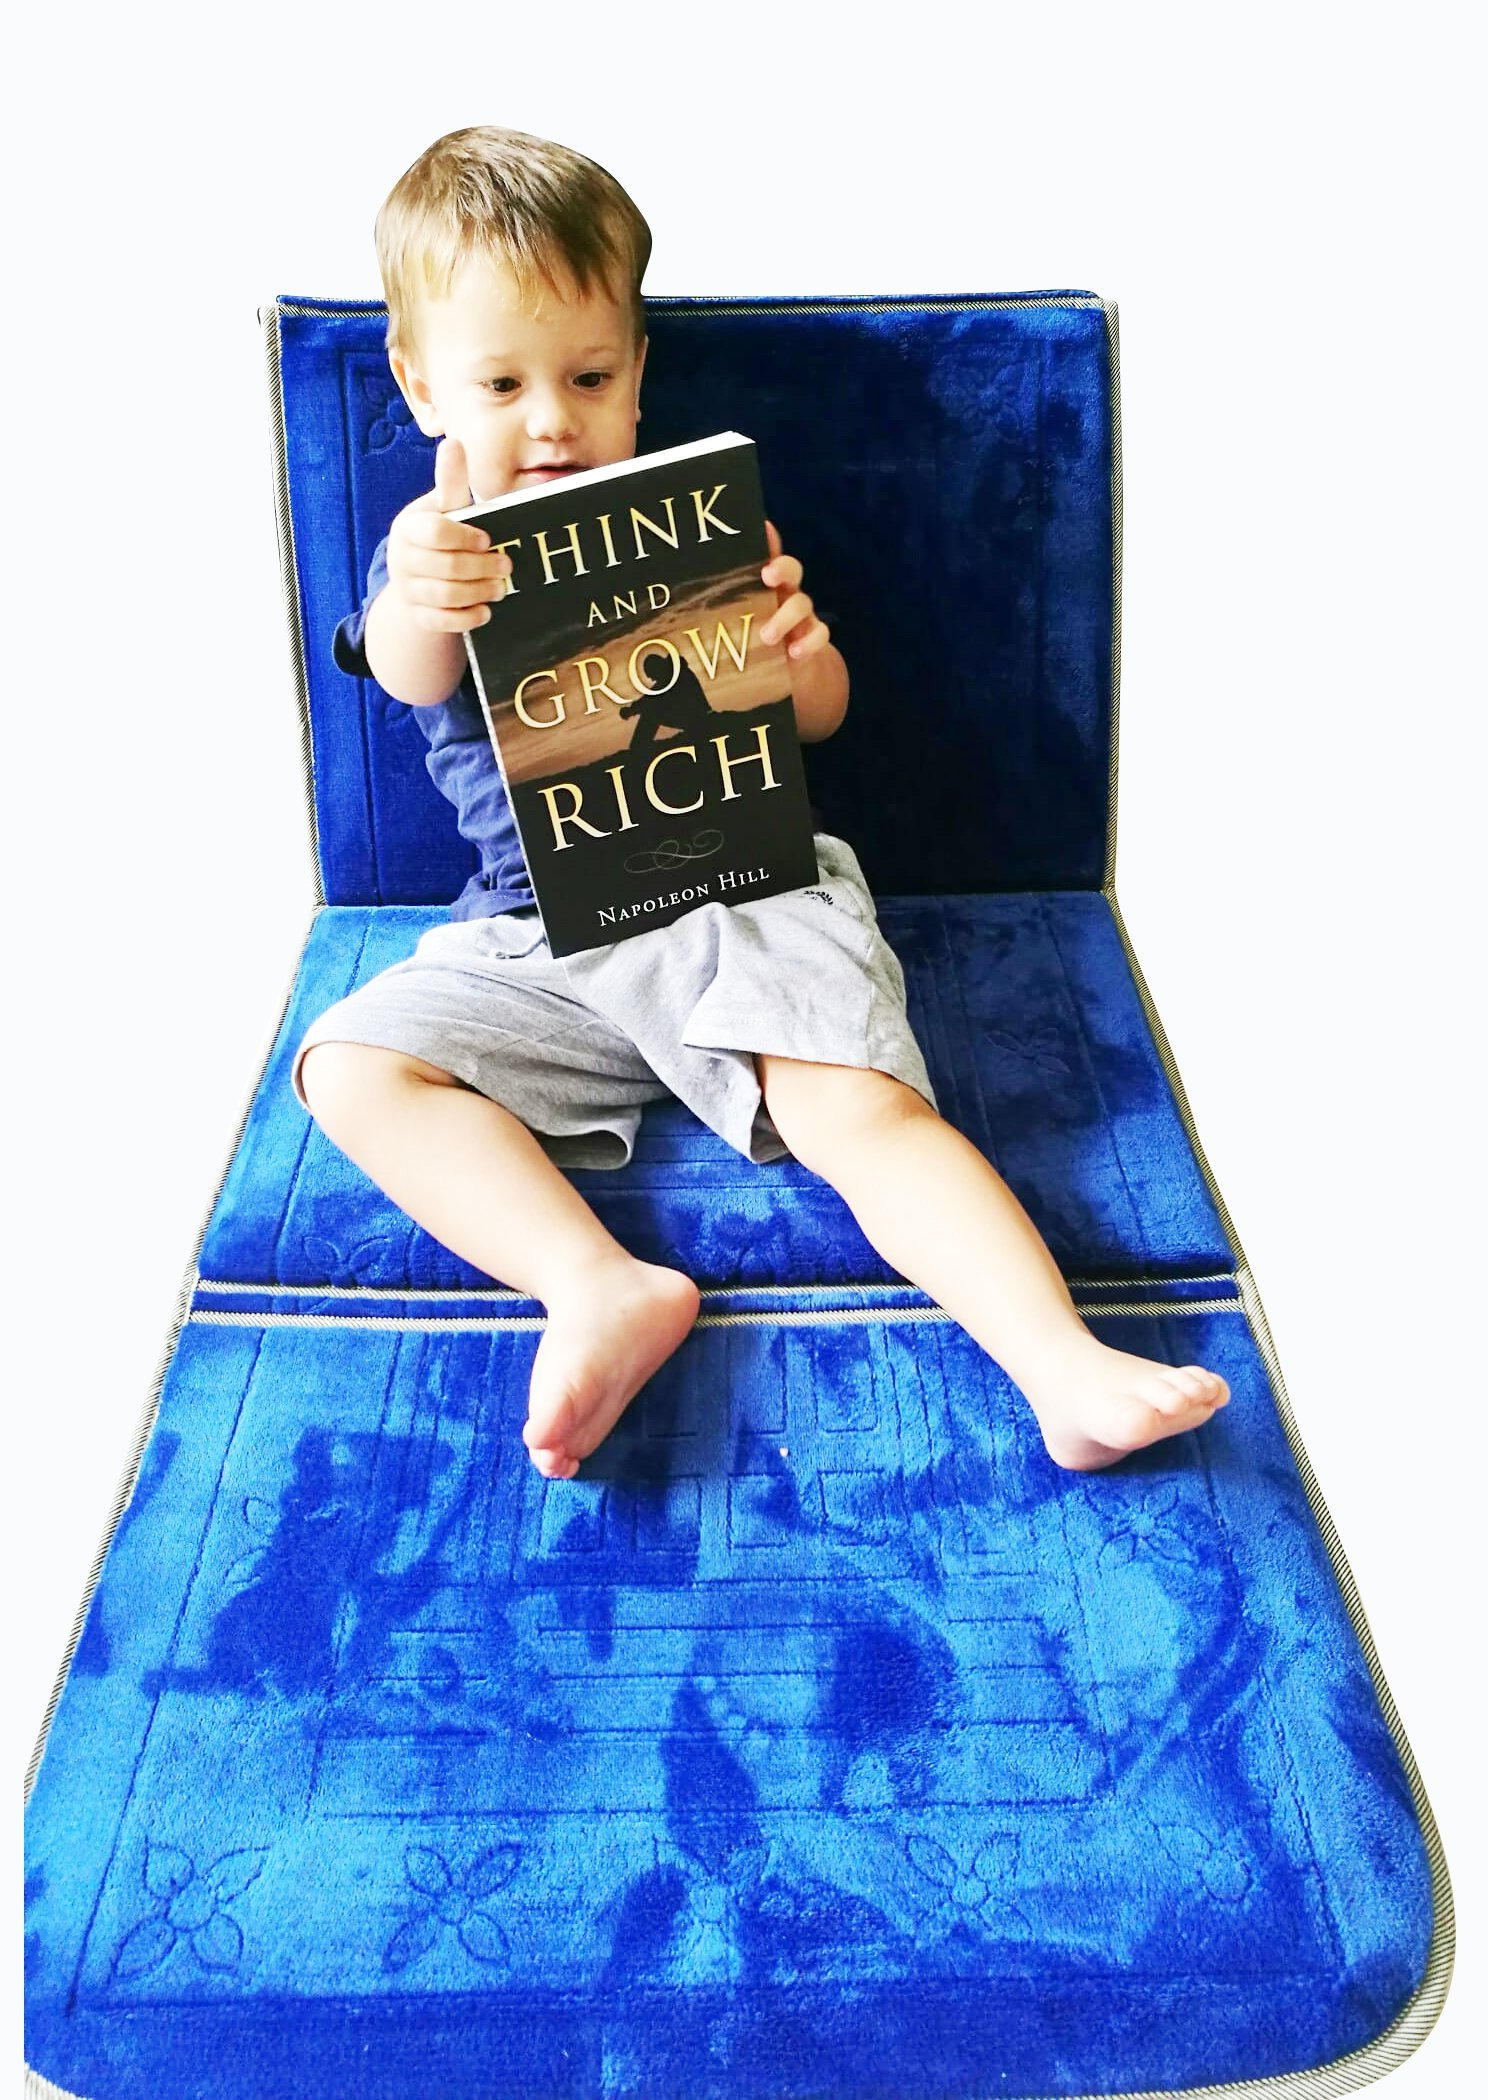 iSeat folding chair rug with backrest - Indoor Blue, prayer rug, meditation chair, floor chair / lounger, tv chair, floor cushion, foldable mat / carpet, kids, relax, read, yoga, picnic, beach, travel